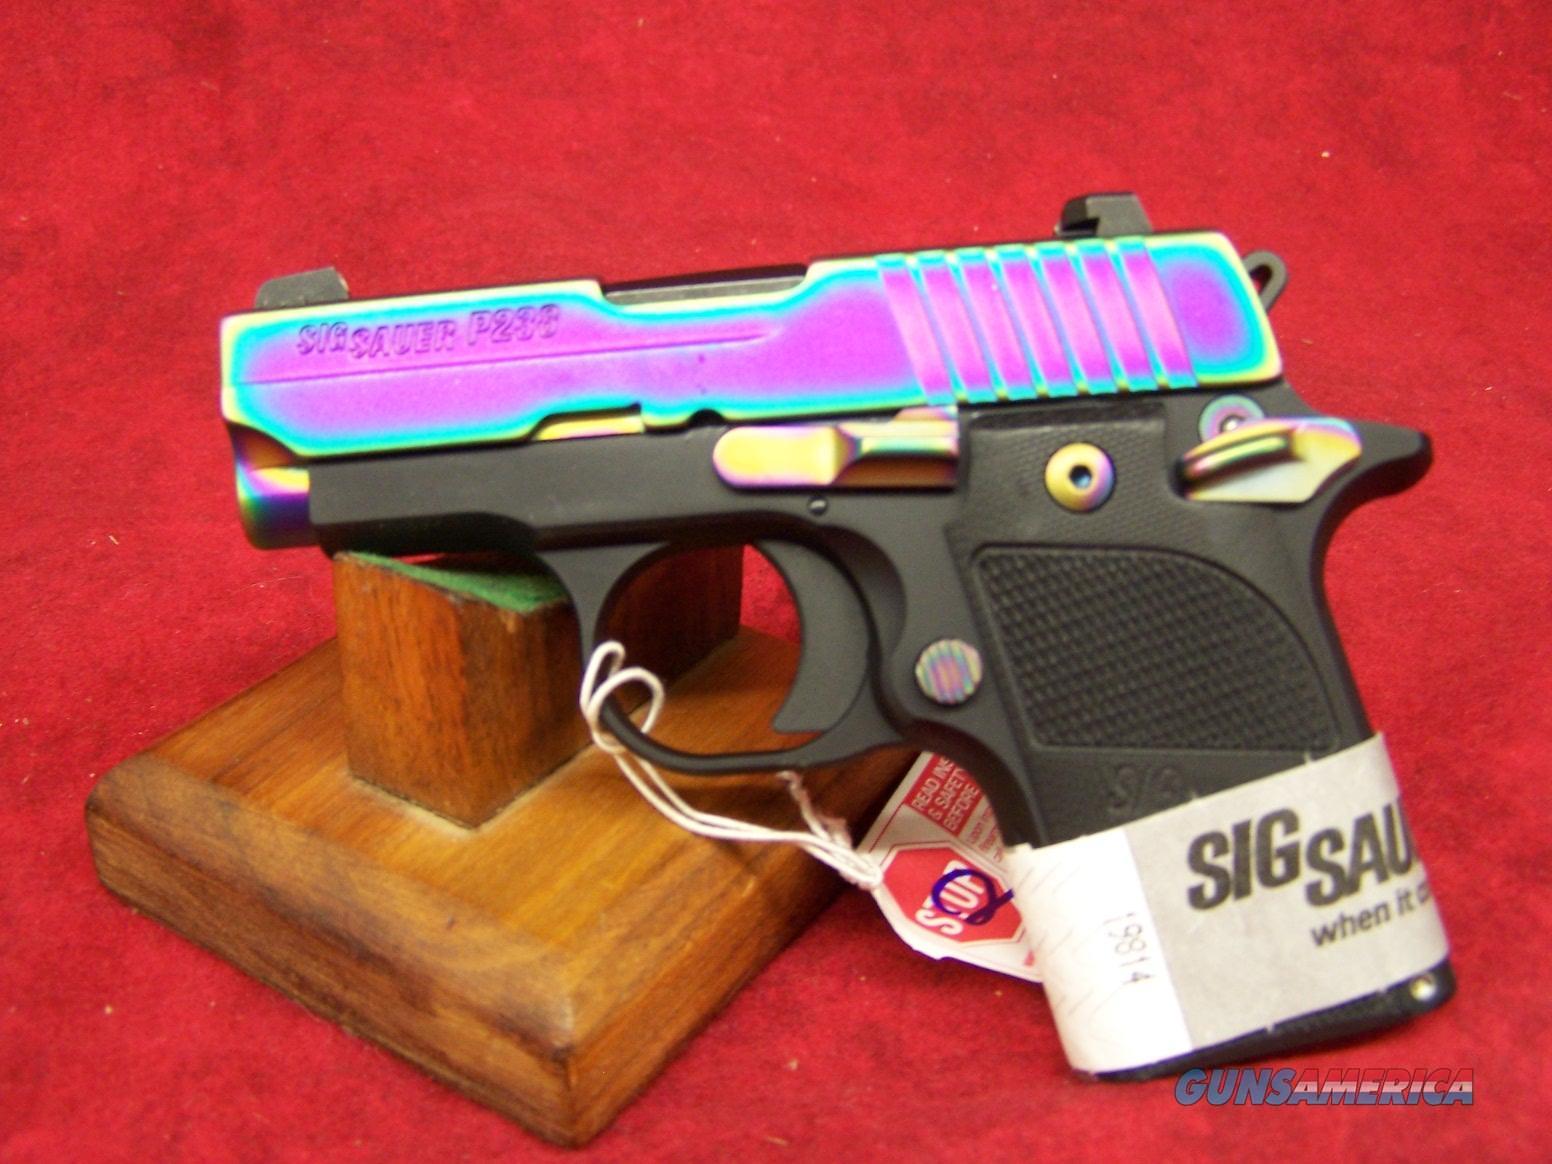 NEW LOW PRICE!! Sig Sauer 238-380-EDGE P238 Edge Pistol .380 ACP 2.72in 6rd Rainbow G10  Guns > Pistols > Sig - Sauer/Sigarms Pistols > P238